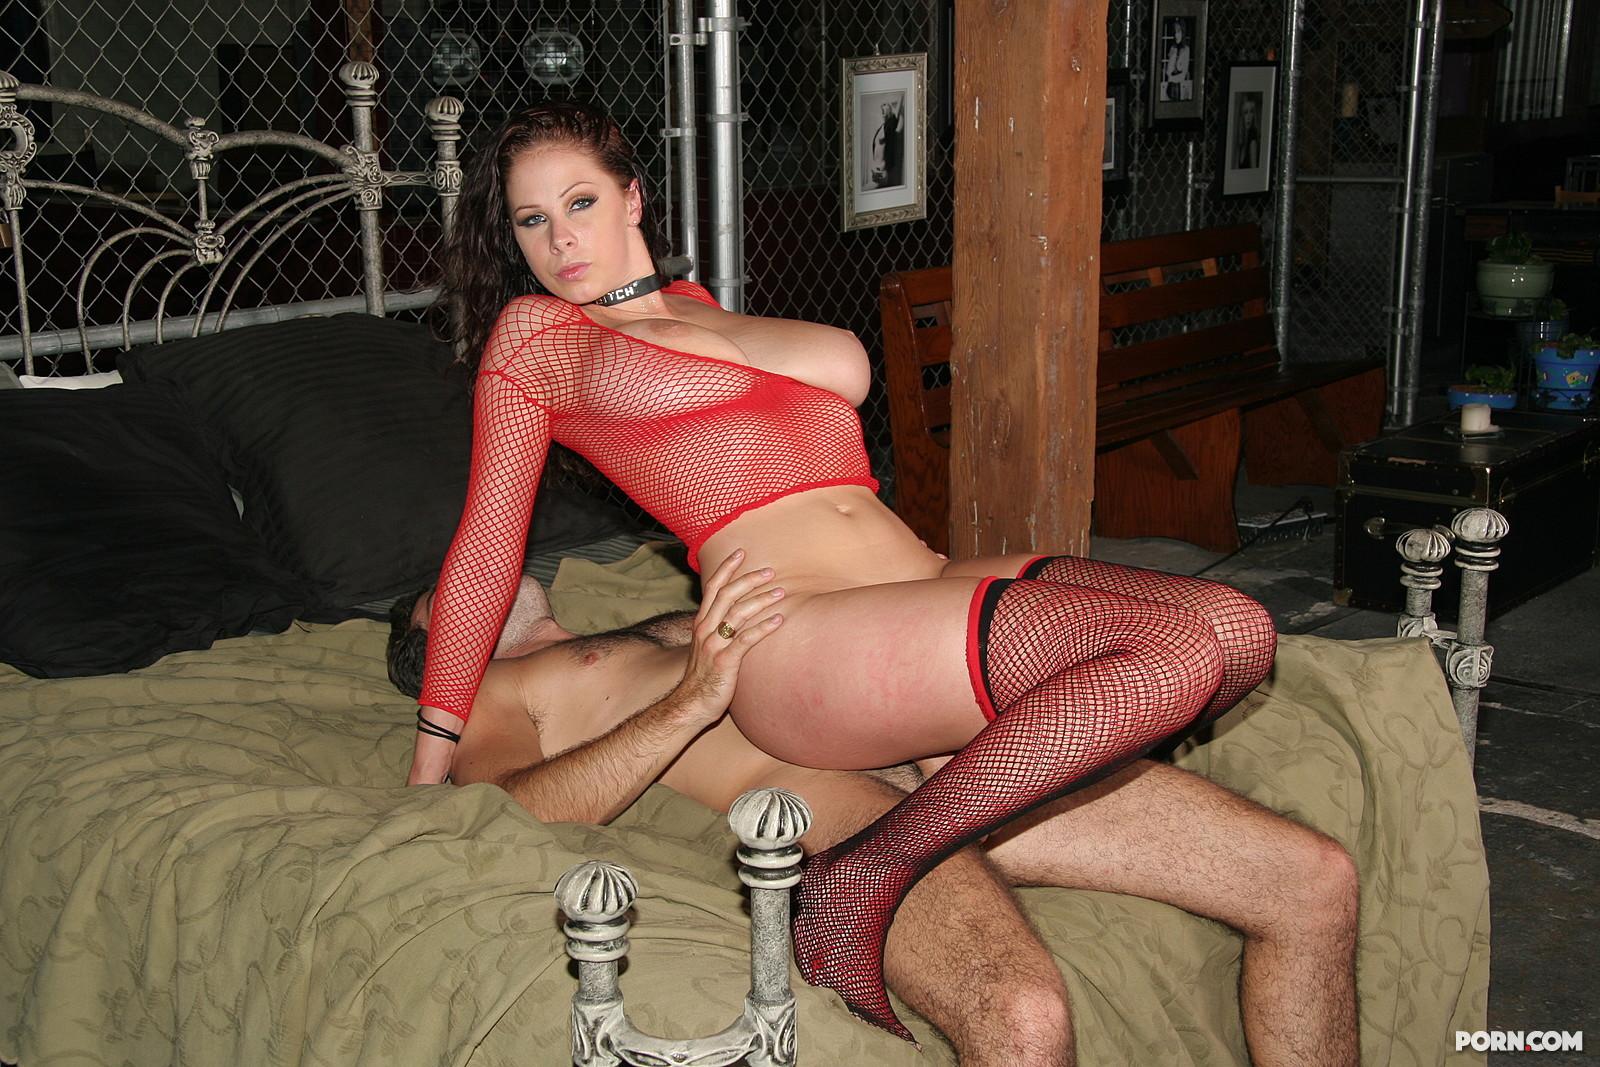 Рабыни ублажают хозяина порно онлайн 5 фотография